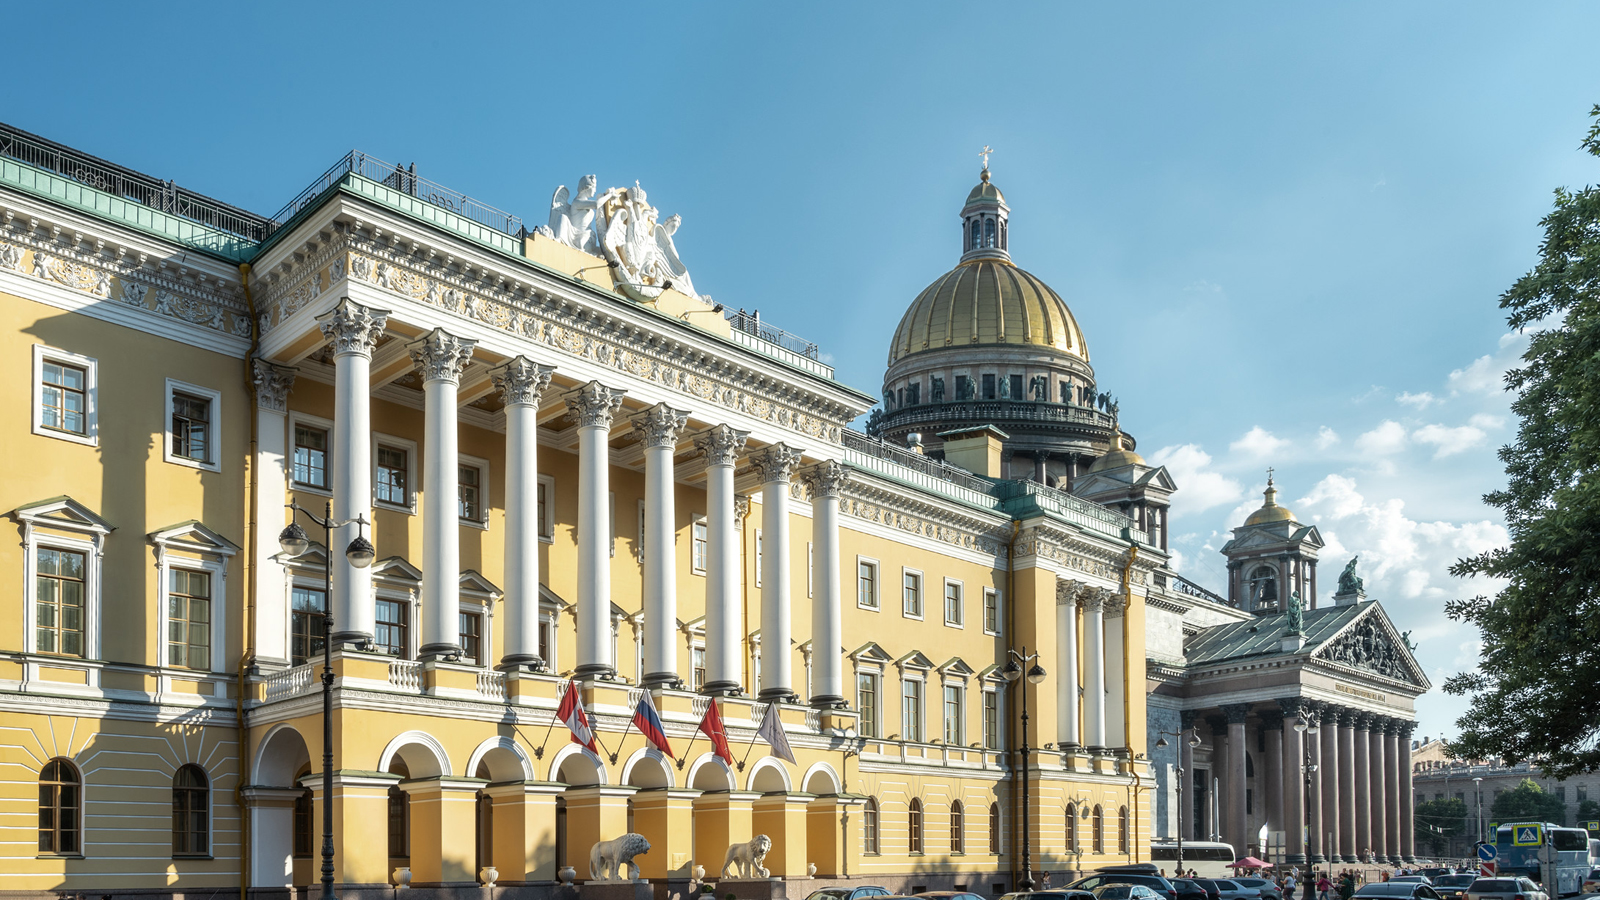 فندق فورسيزونز ليون بالاس سان بطرسبرغ